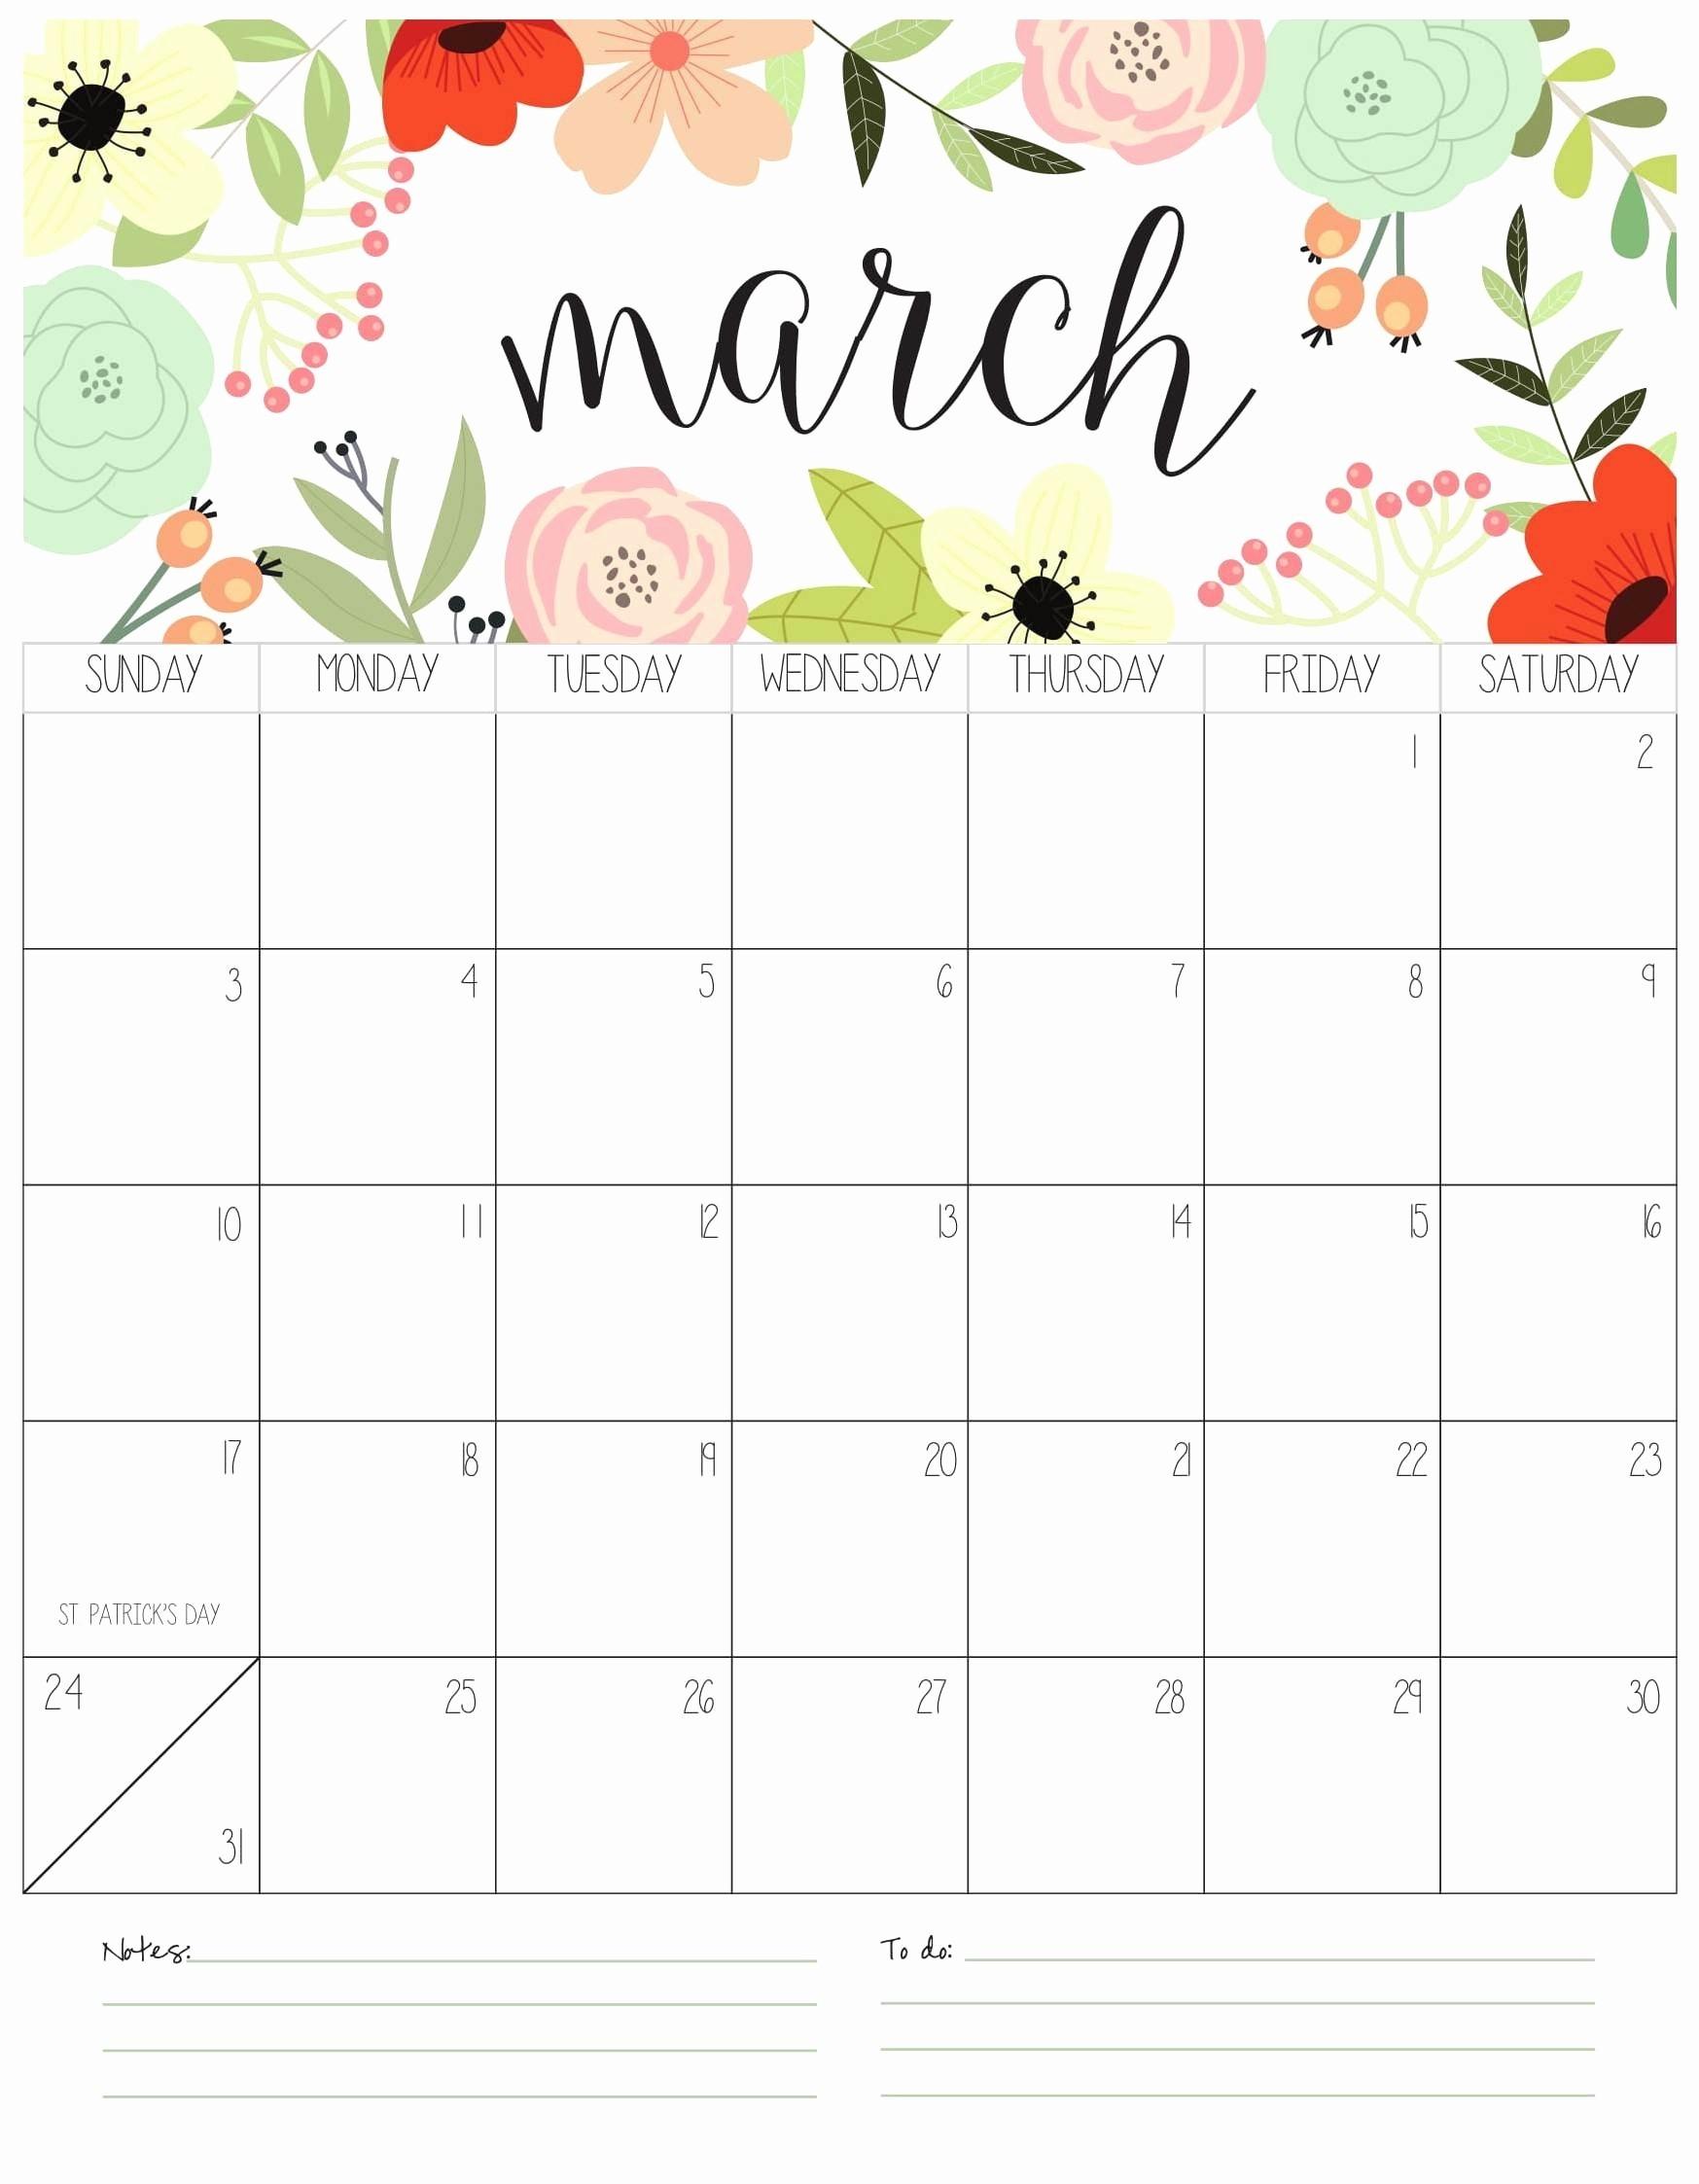 National Food Day July 2019 Calendar Printable | Calendar-Calander Of Monthly Food Days